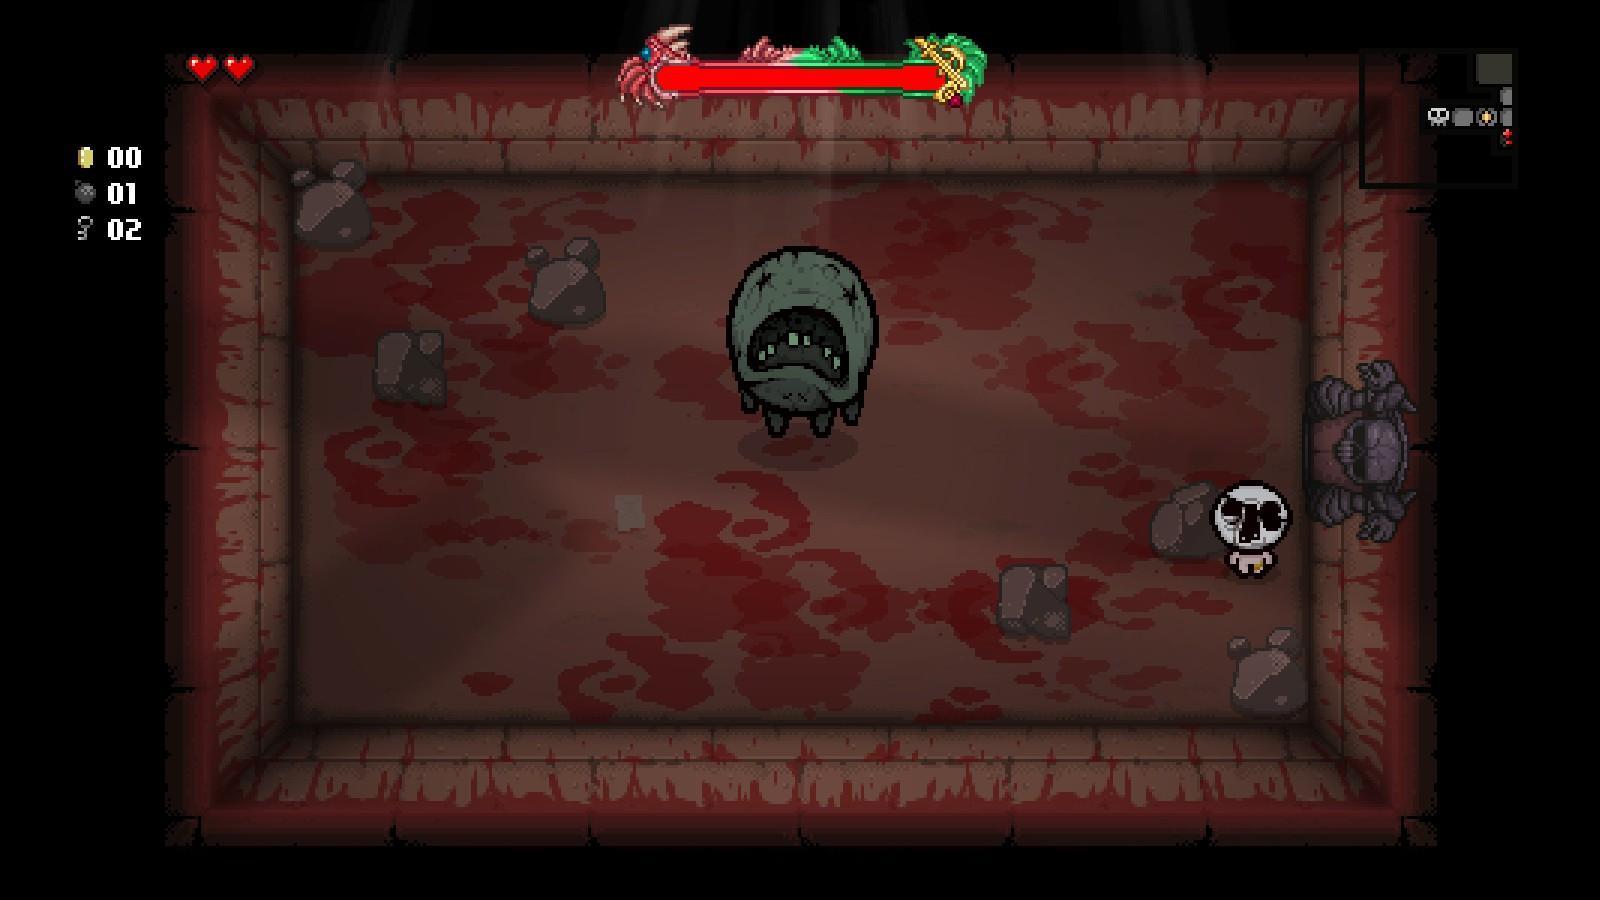 Terraria Crimson boss health bar - Modding of Isaac